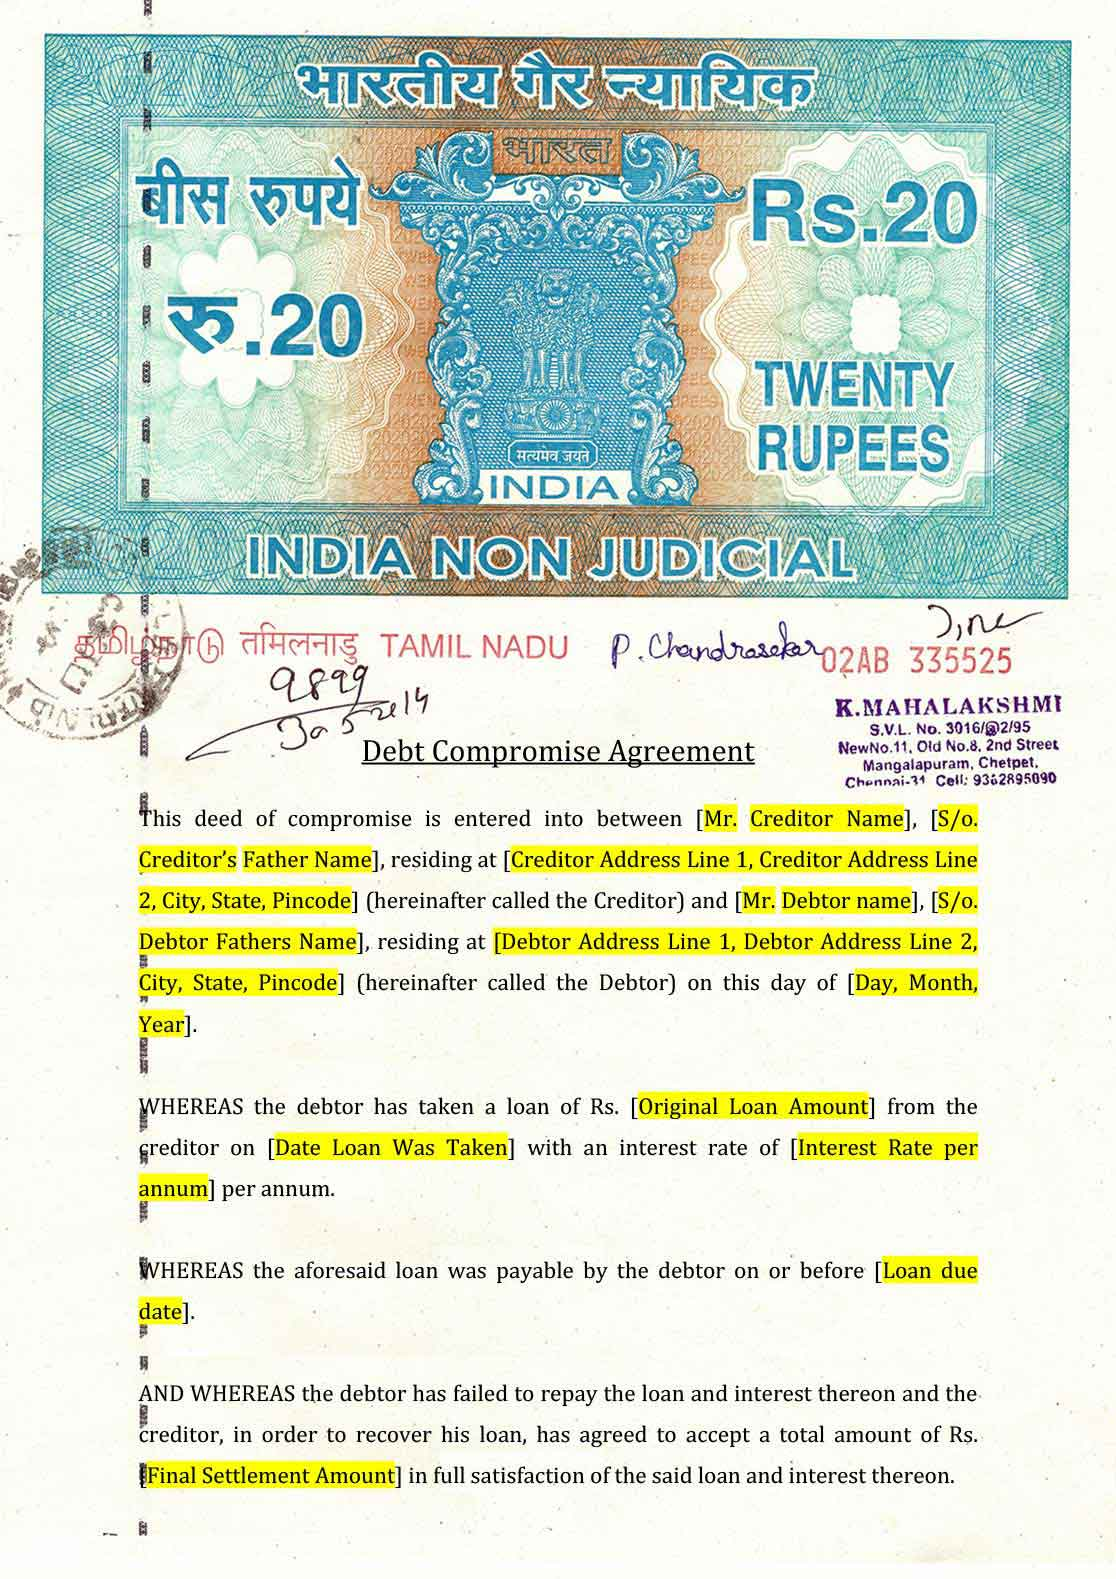 Debt Compromise Agreement Format